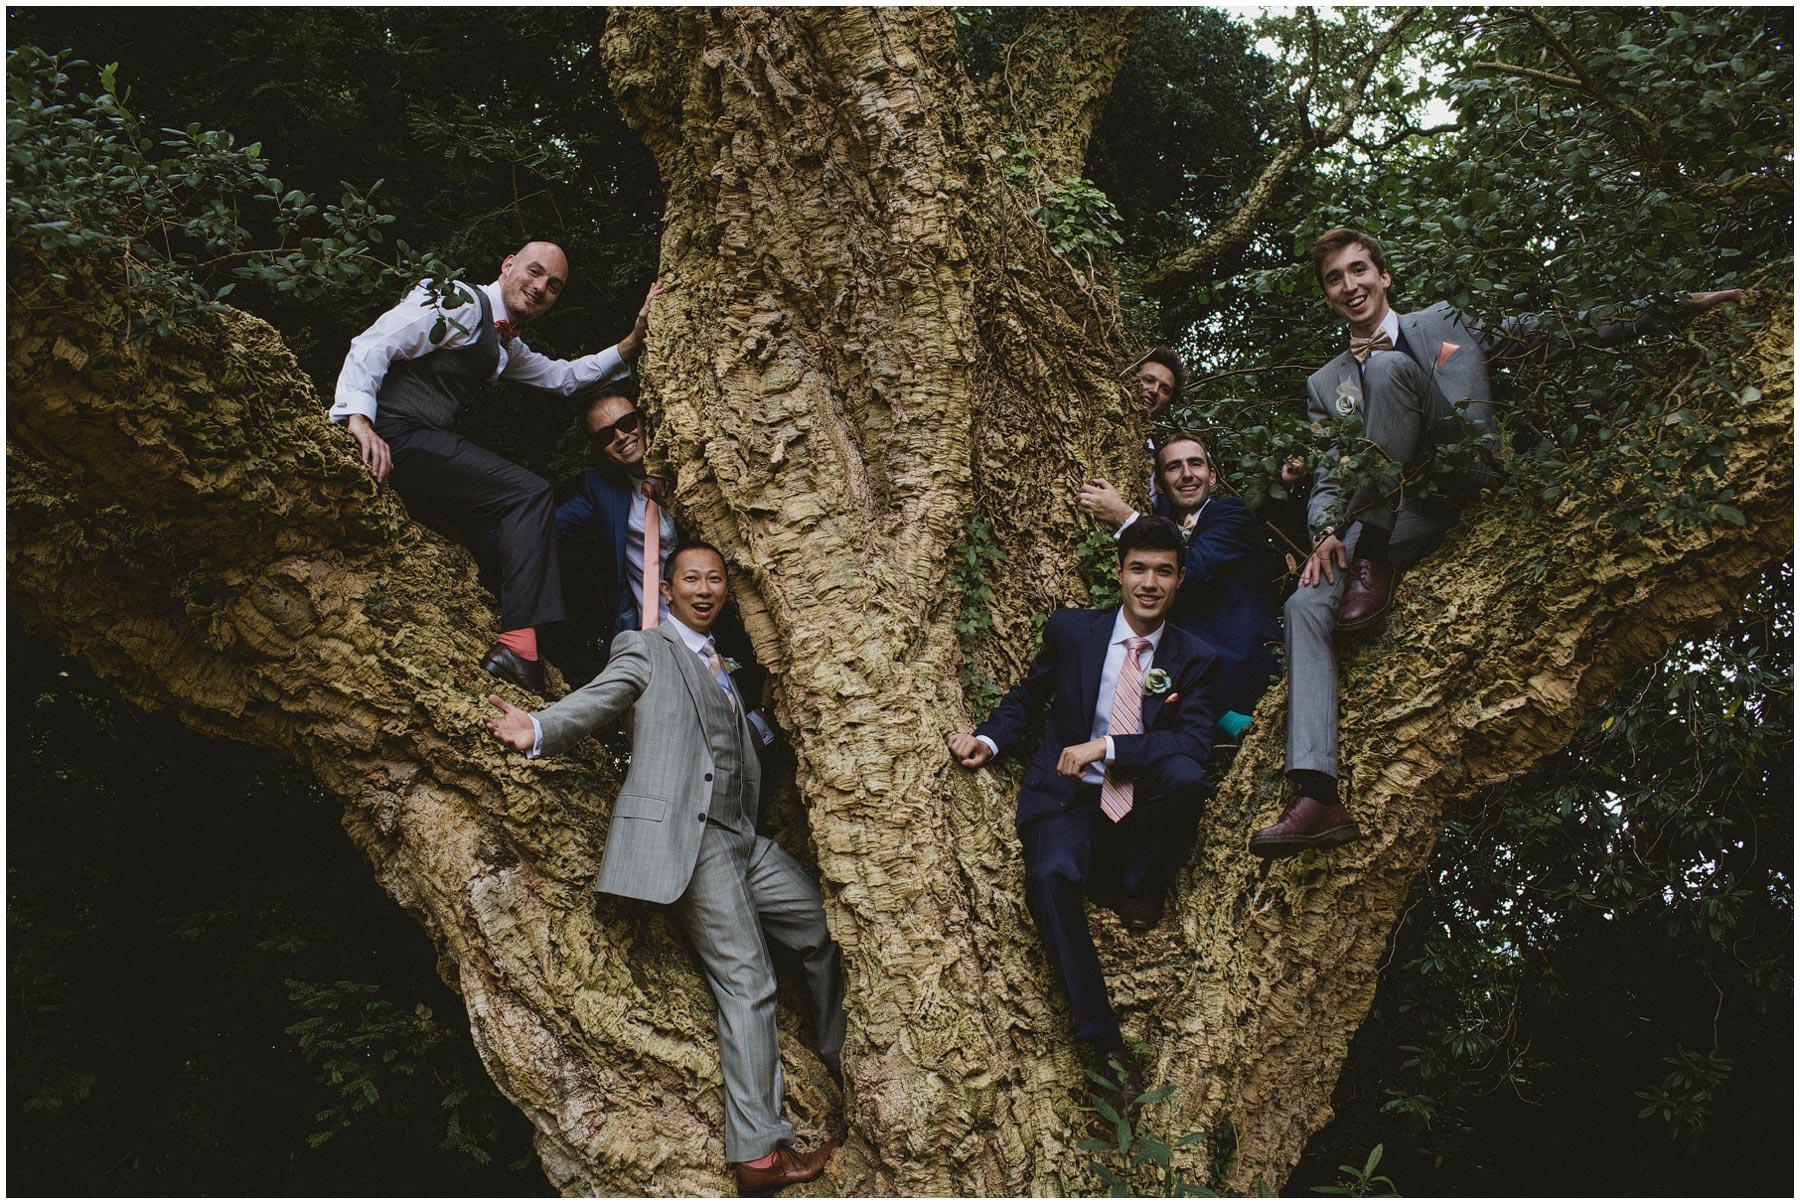 Colehayes-Park-Wedding-Photography_0153